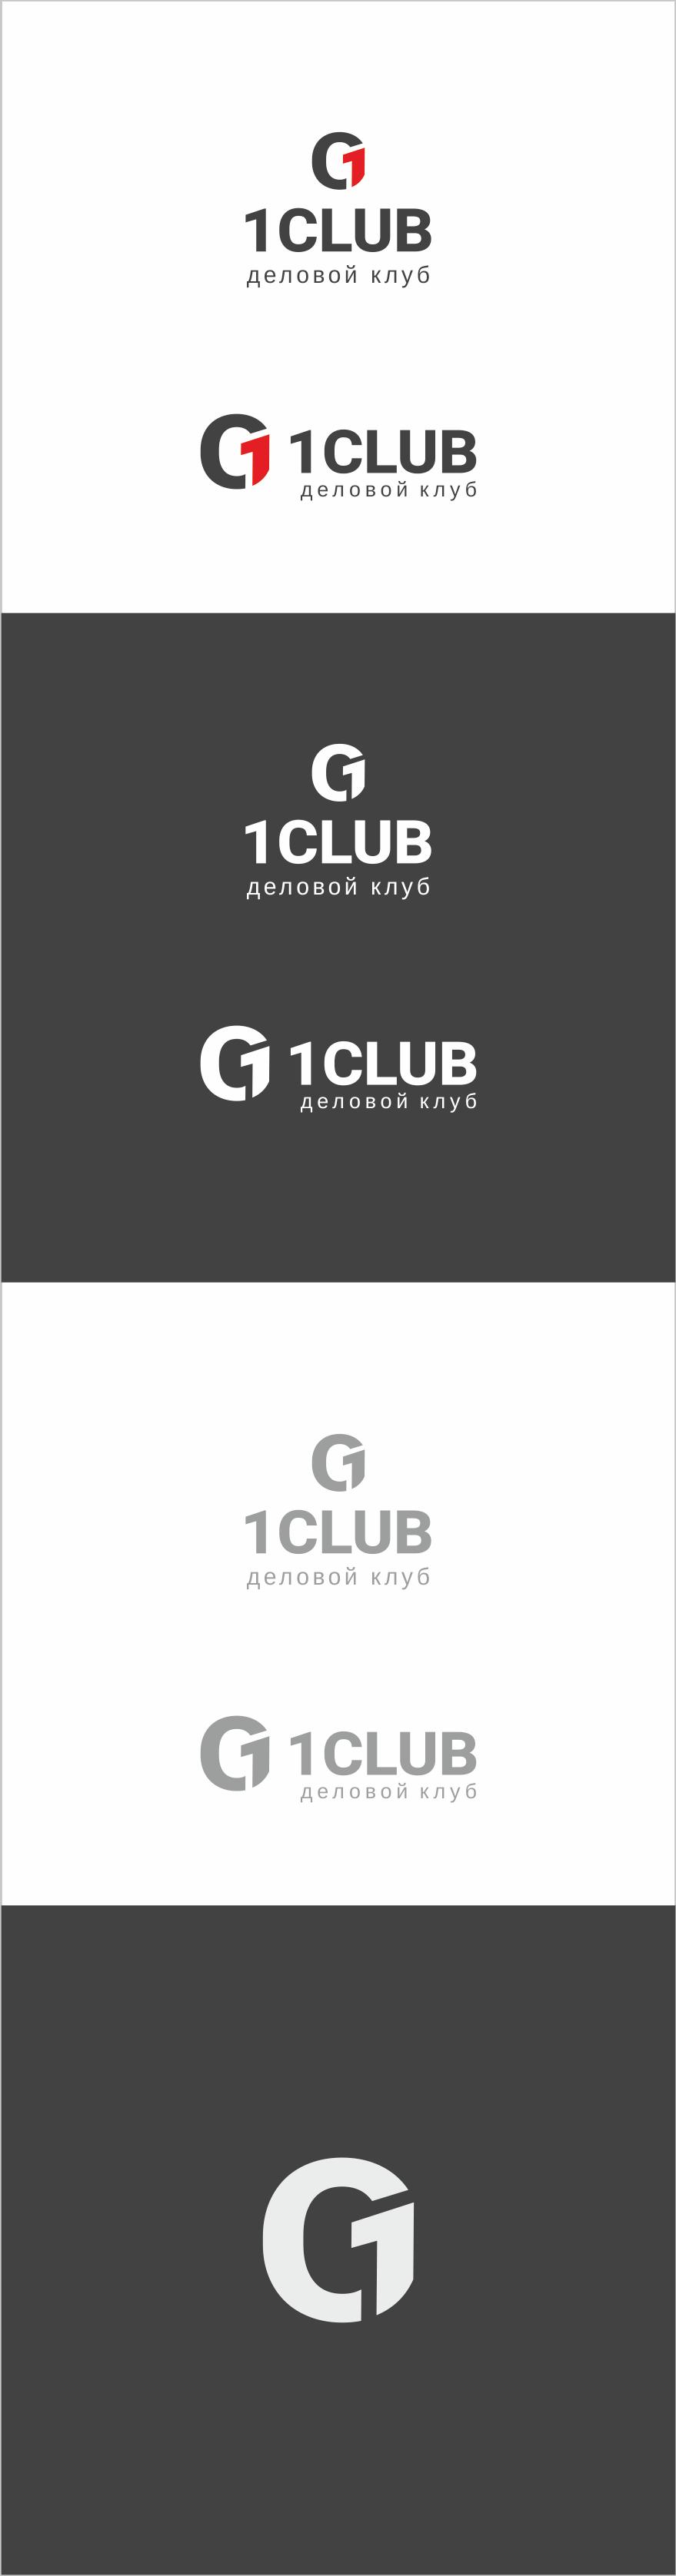 Логотип делового клуба фото f_8895f86f2aa053f5.png